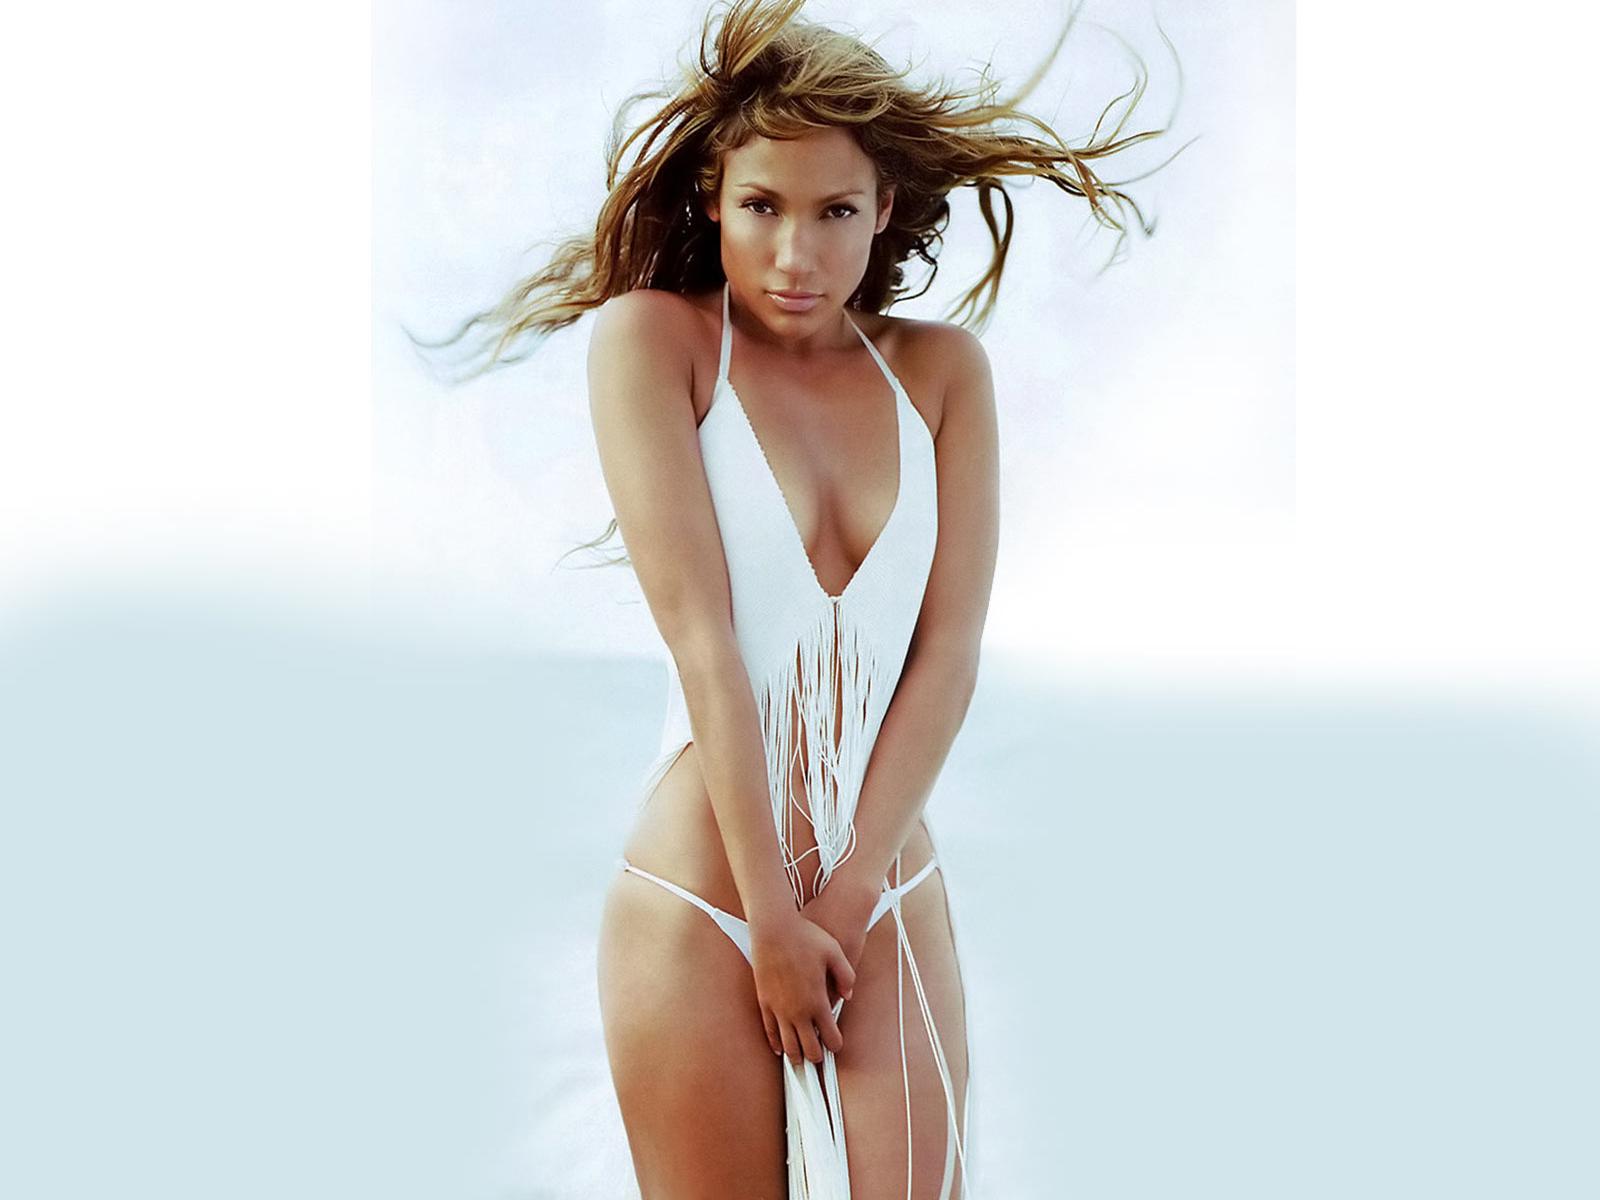 http://2.bp.blogspot.com/_vhrtkyeqwhk/TJTBmaE6ITI/AAAAAAAAAO0/mNGNSnuaAhE/s1600/Jennifer+Lopez+Latest+Photos+%2813%29.jpg